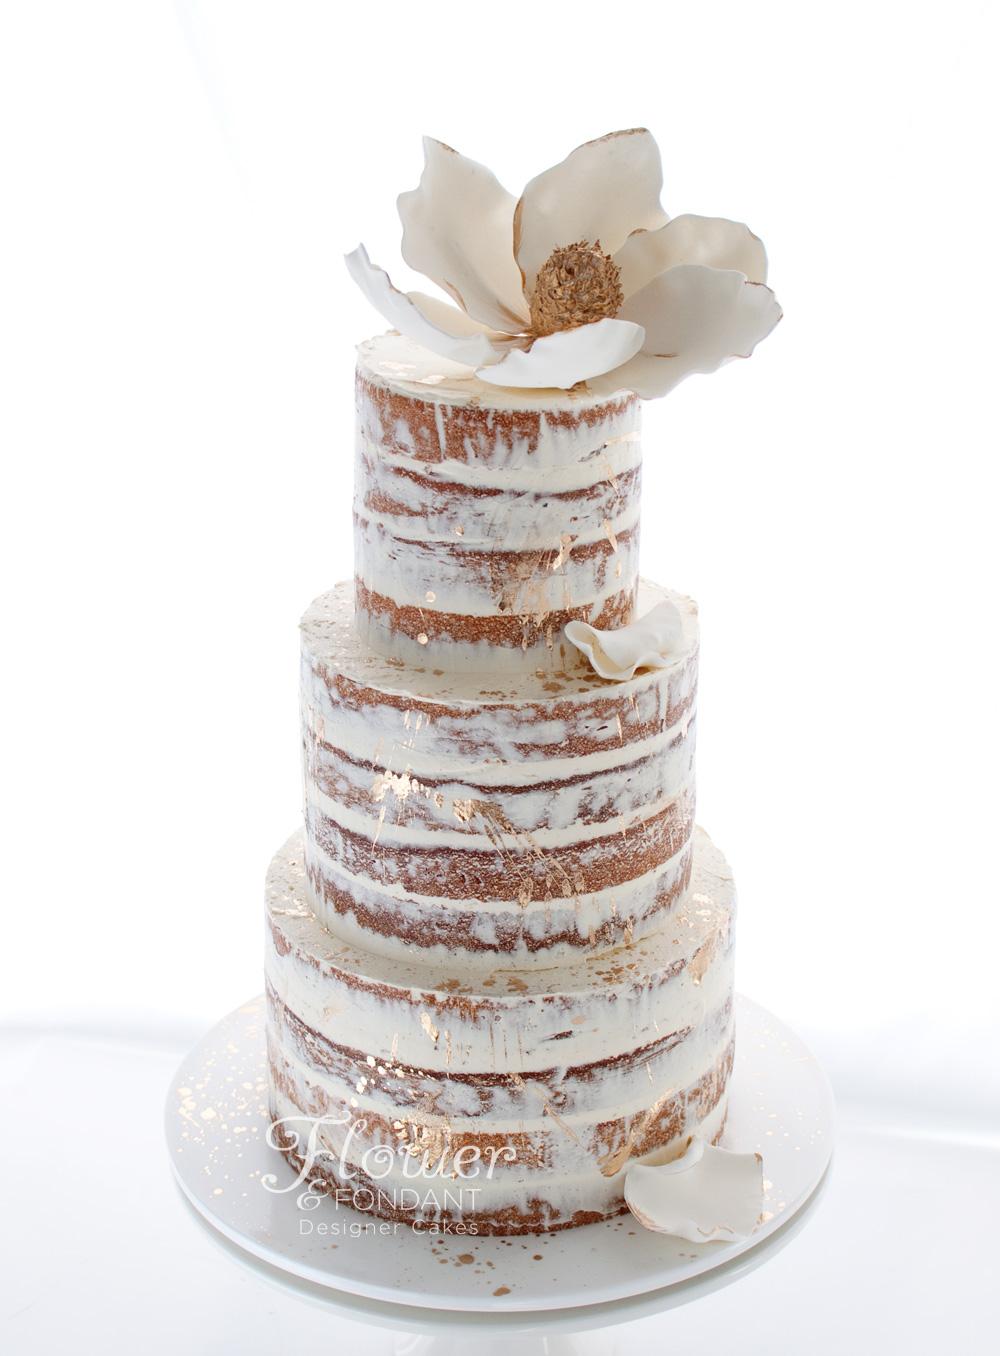 Elegant, chic... and sparkly! Photo: Flower & Fondant Designer Cakes